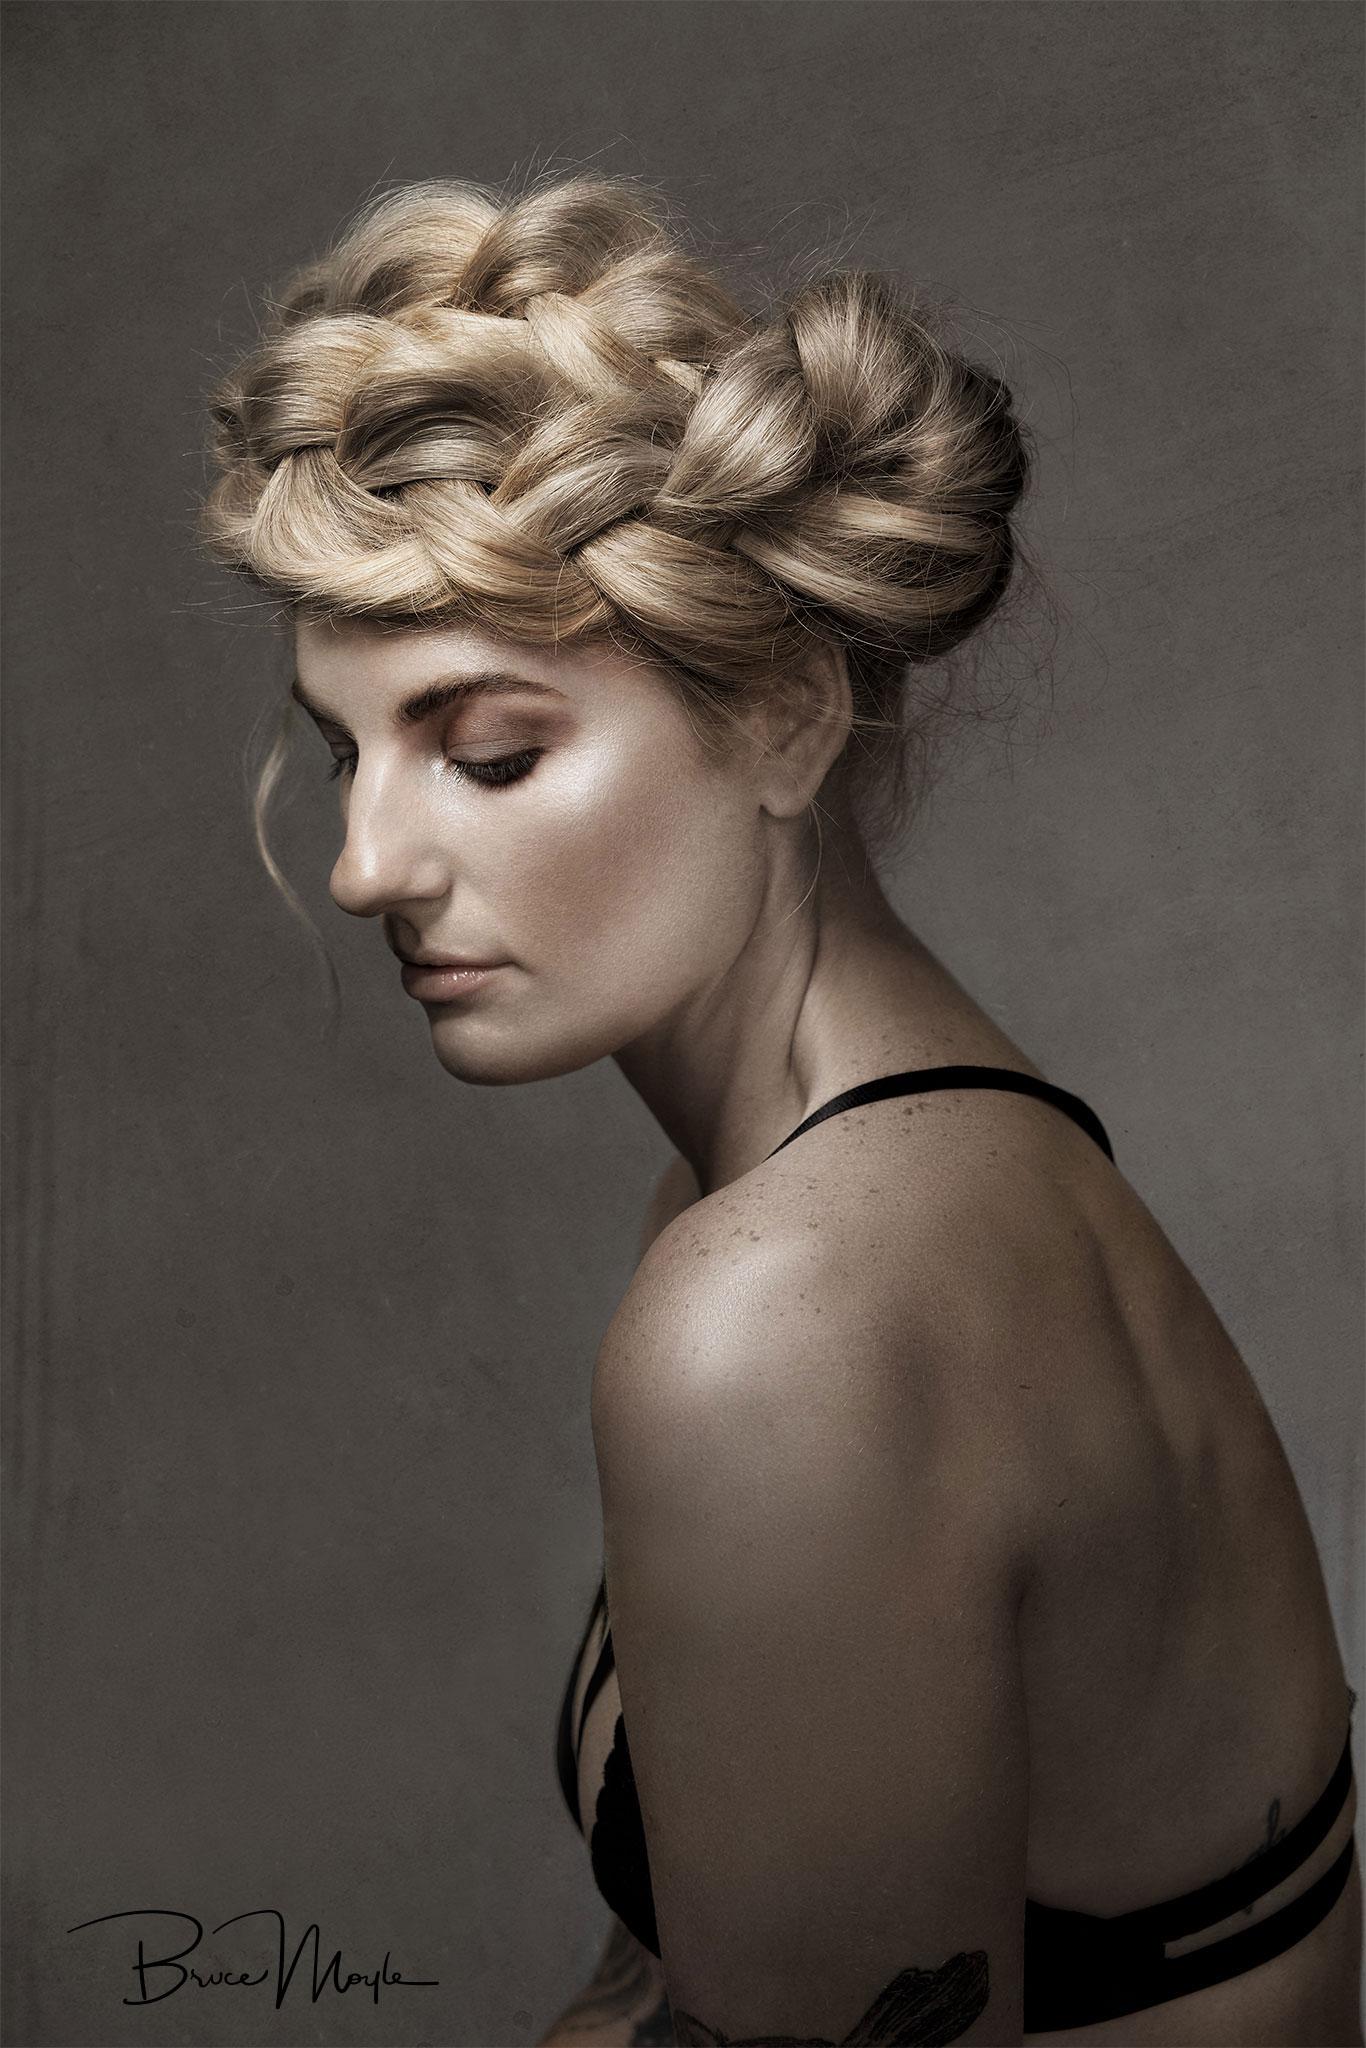 AAI004---Clare-Dornauf-Hair-Shoot---022.jpg